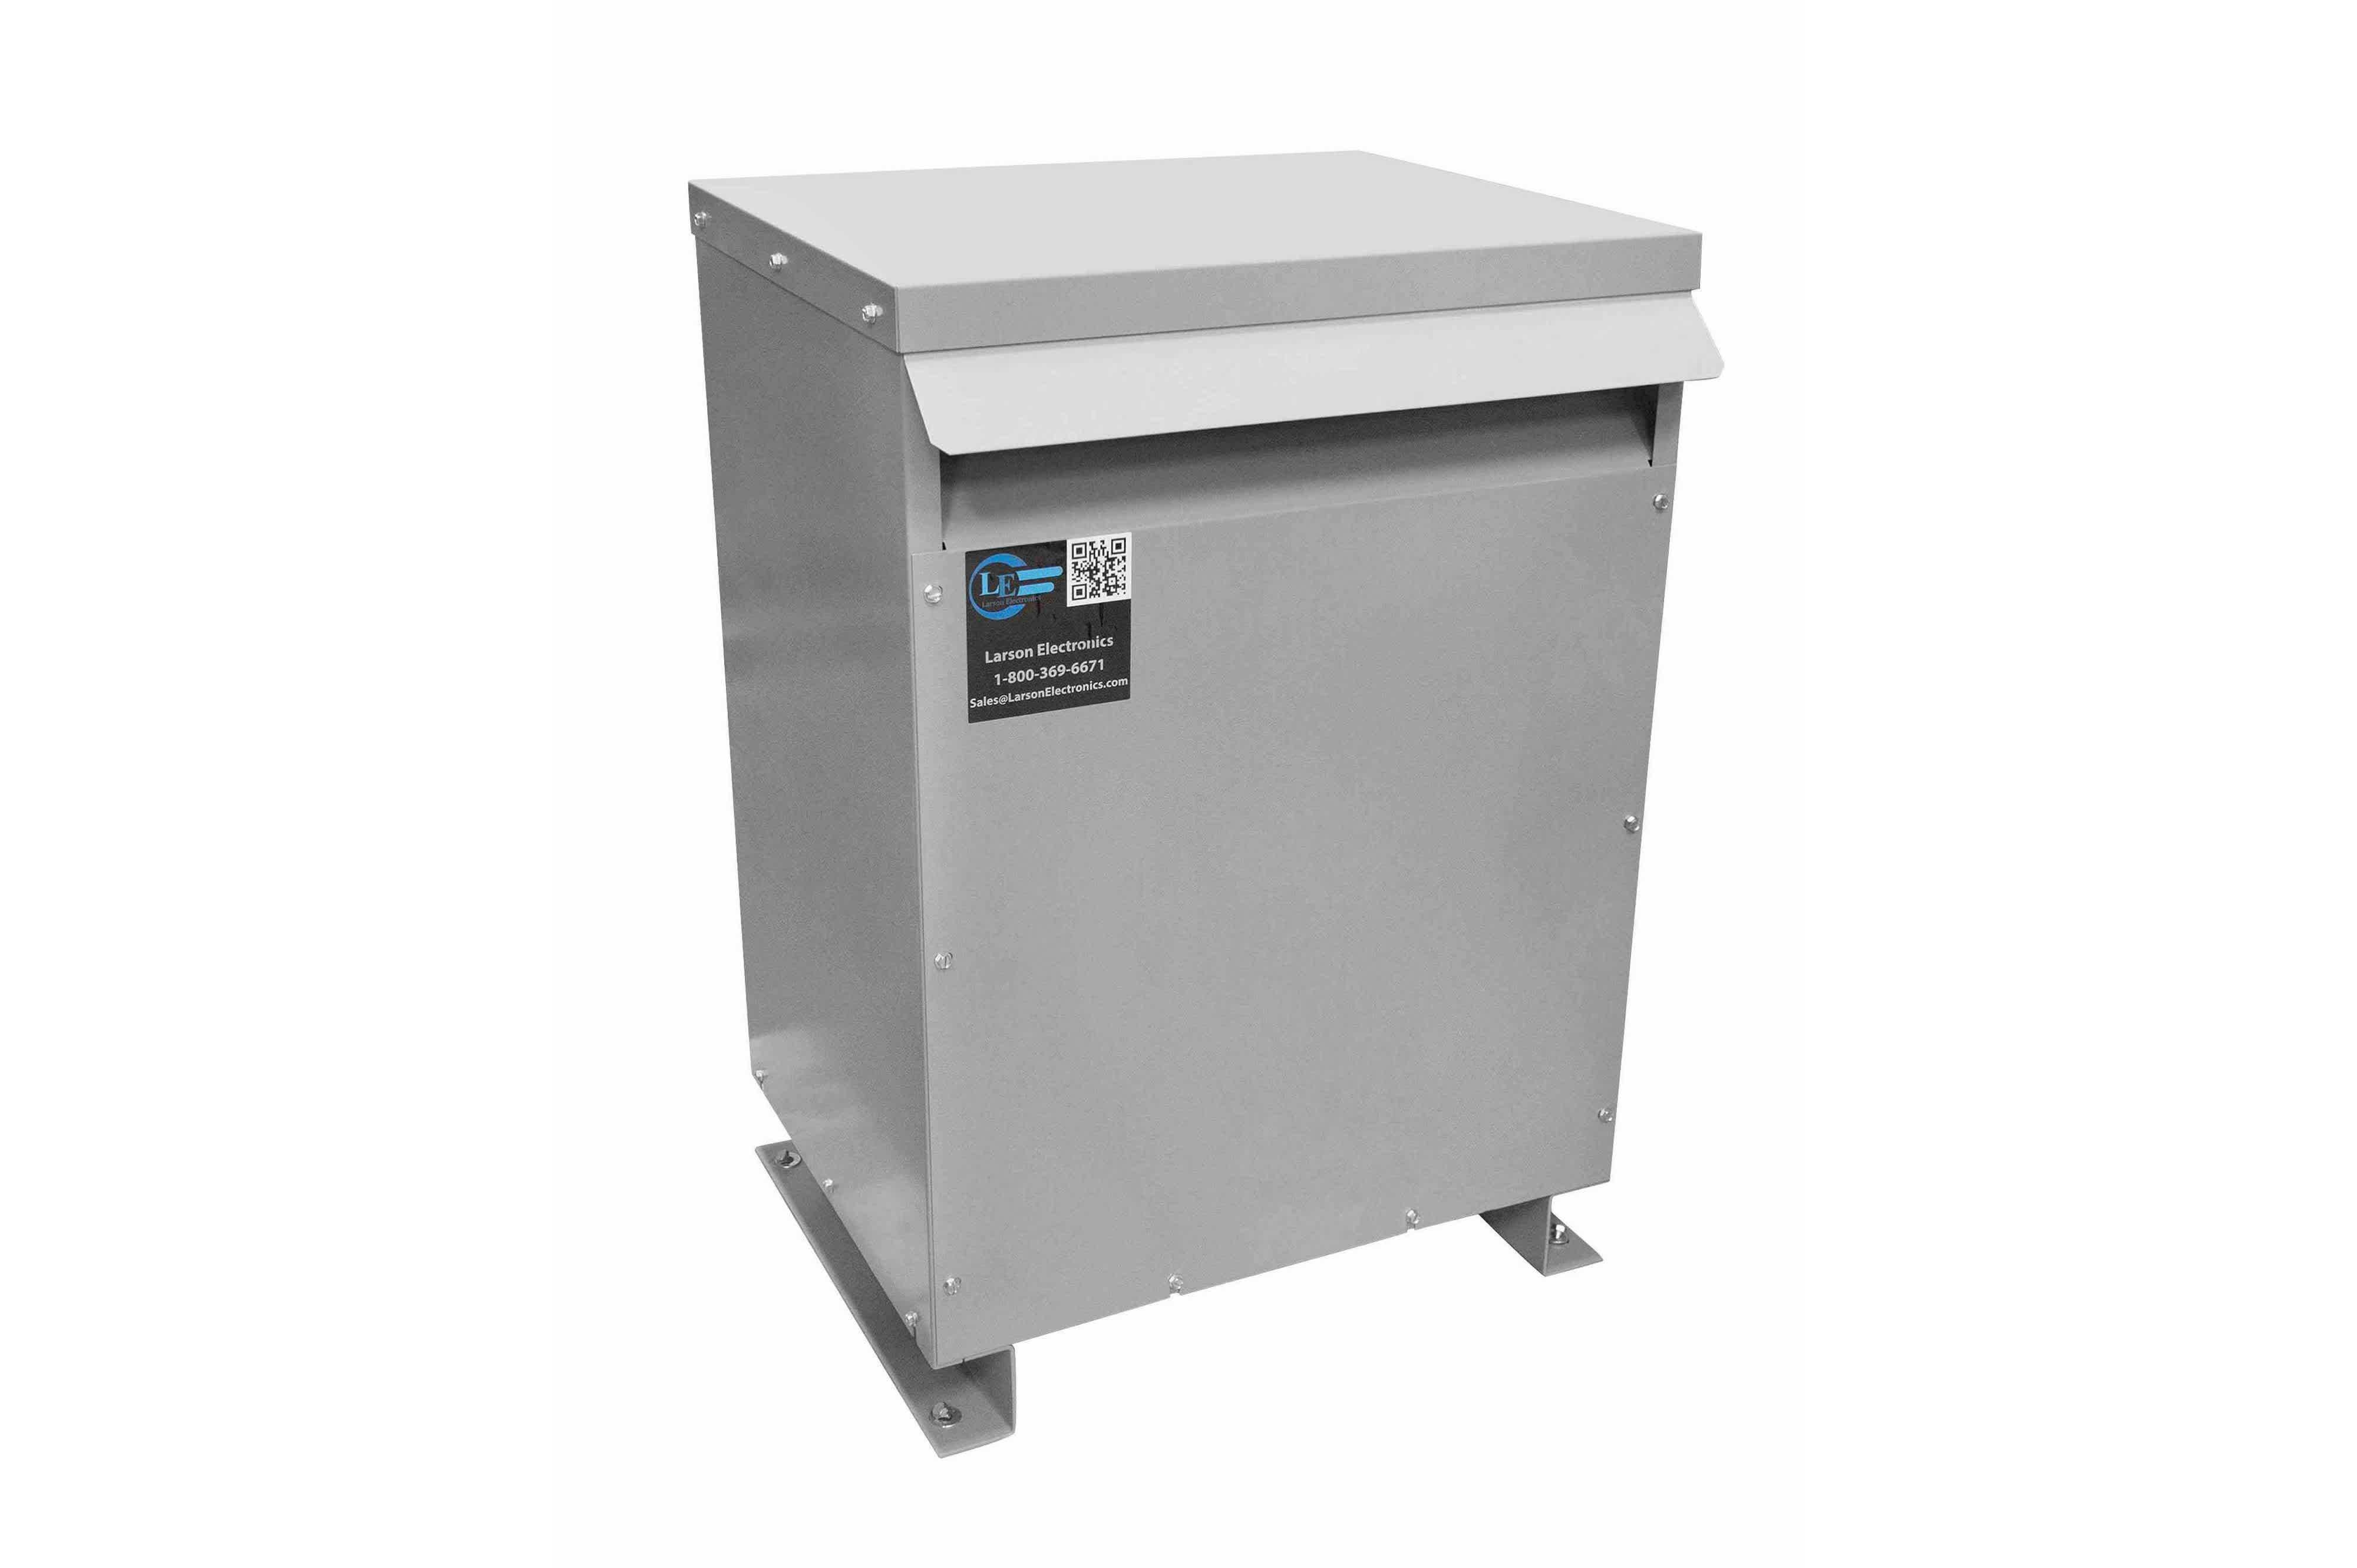 29 kVA 3PH Isolation Transformer, 240V Wye Primary, 415Y/240 Wye-N Secondary, N3R, Ventilated, 60 Hz